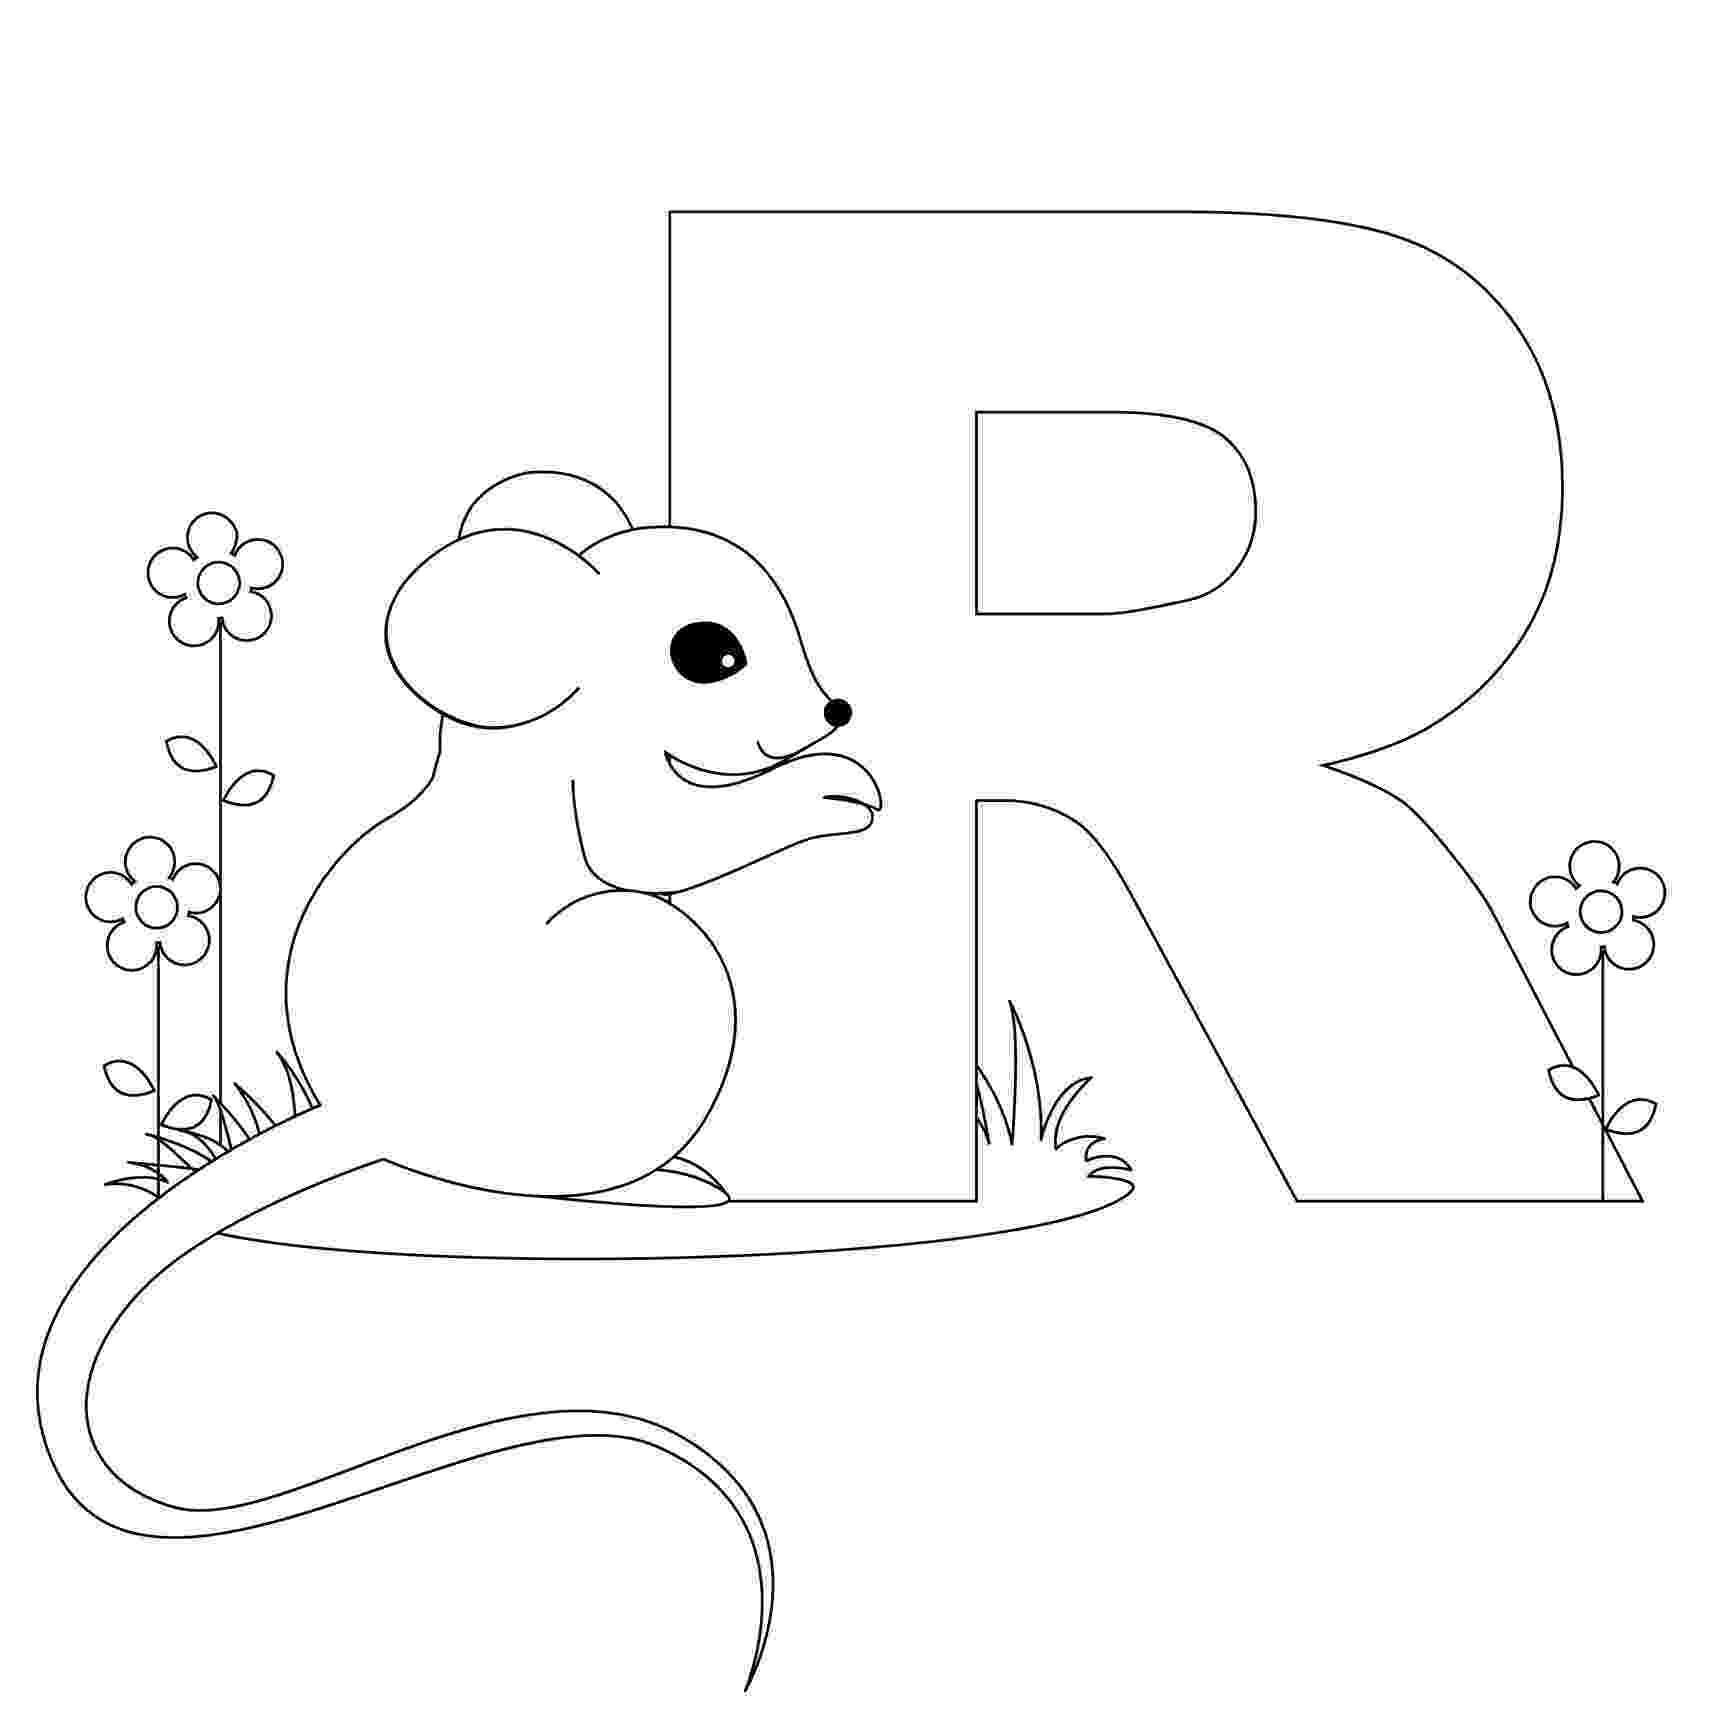 coloring book alphabet free printable alphabet coloring pages for kids best alphabet book coloring 1 7